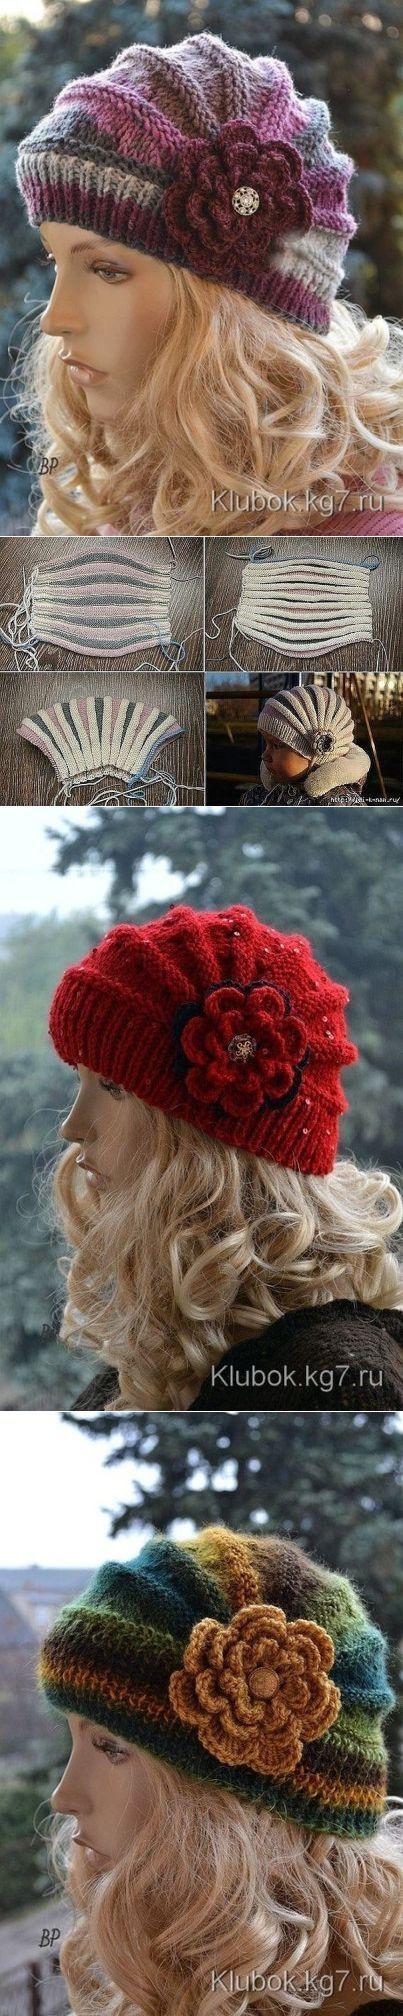 Оригинальная и очень красивая шапочка спицами (укороченные ряды) [] #<br/> # #Tissue,<br/> # #Stricken,<br/> # #Gorros #Crochet,<br/> # #Scarves,<br/> # #Hats<br/>